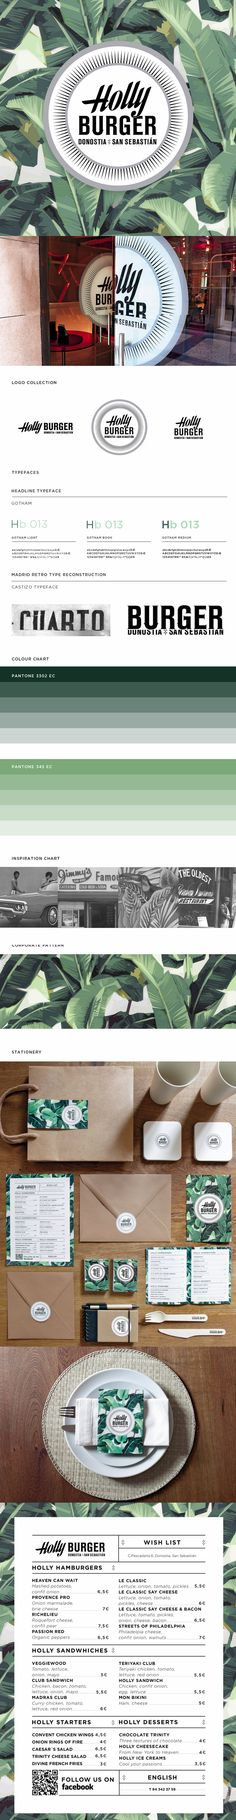 Holly Burger | #stationary #corporate #design #corporatedesign #identity #branding #marketing < repinned by www.BlickeDeeler.de | Take a look at www.LogoGestaltung-Hamburg.de